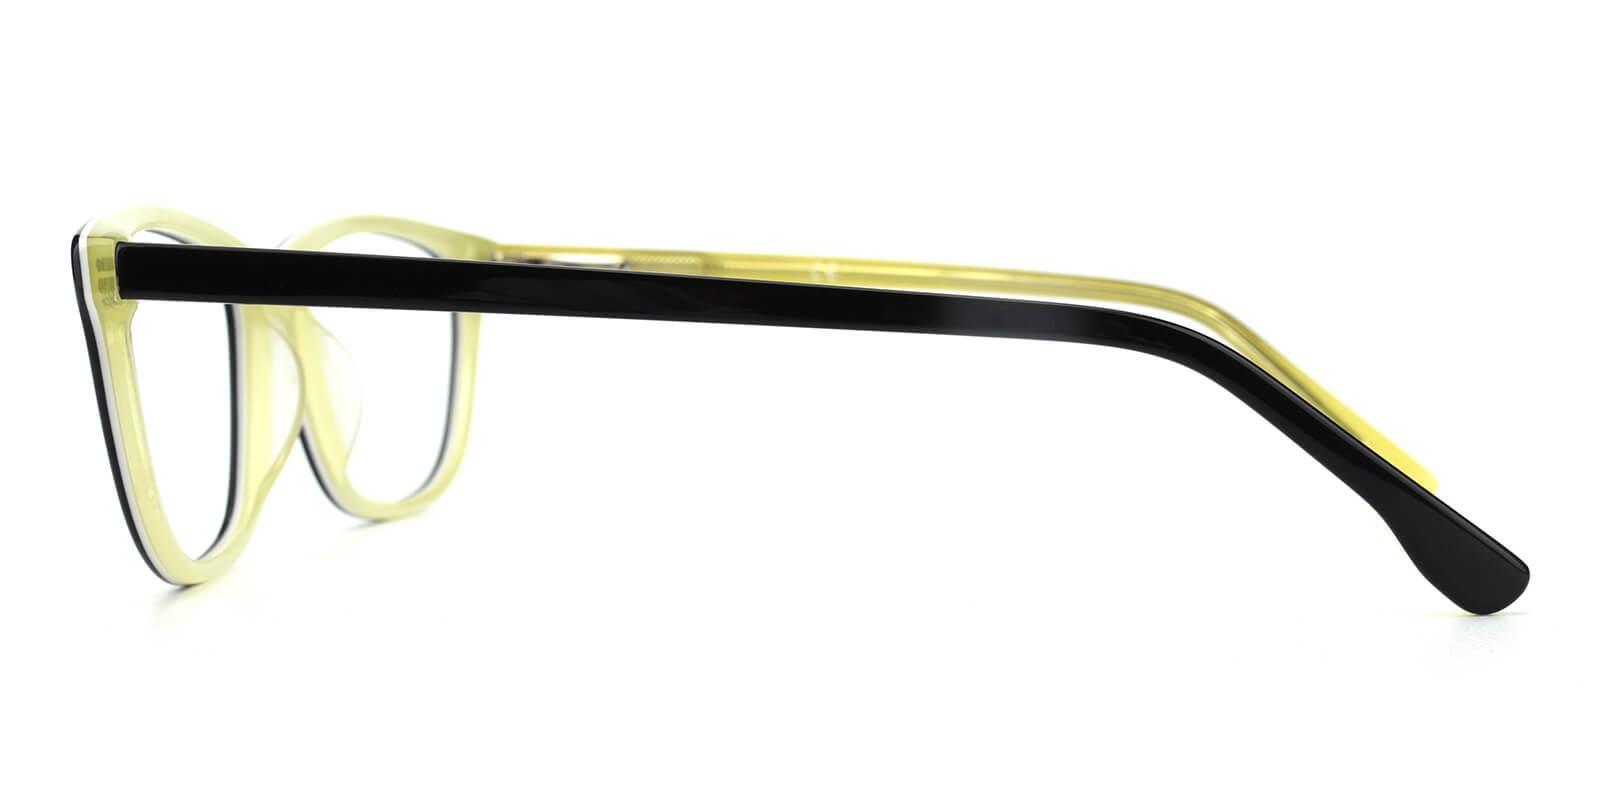 Emblem-Yellow-Square / Cat-Acetate-Eyeglasses-additional3